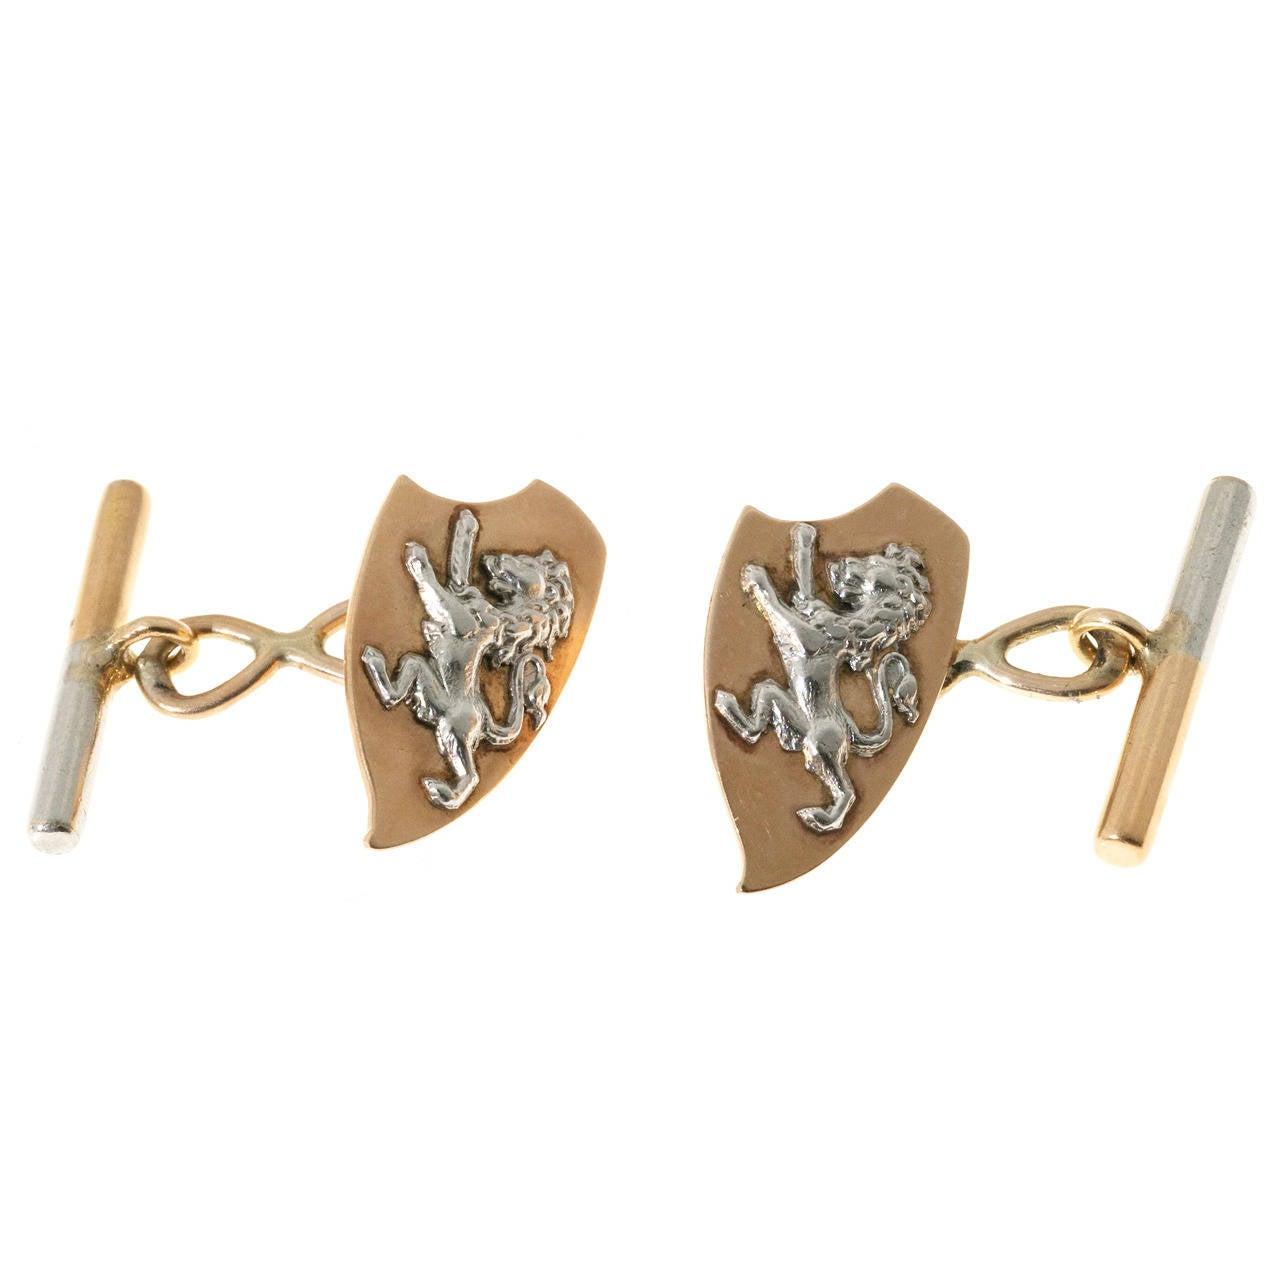 Rose Gold Platinum Lion Cufflinks